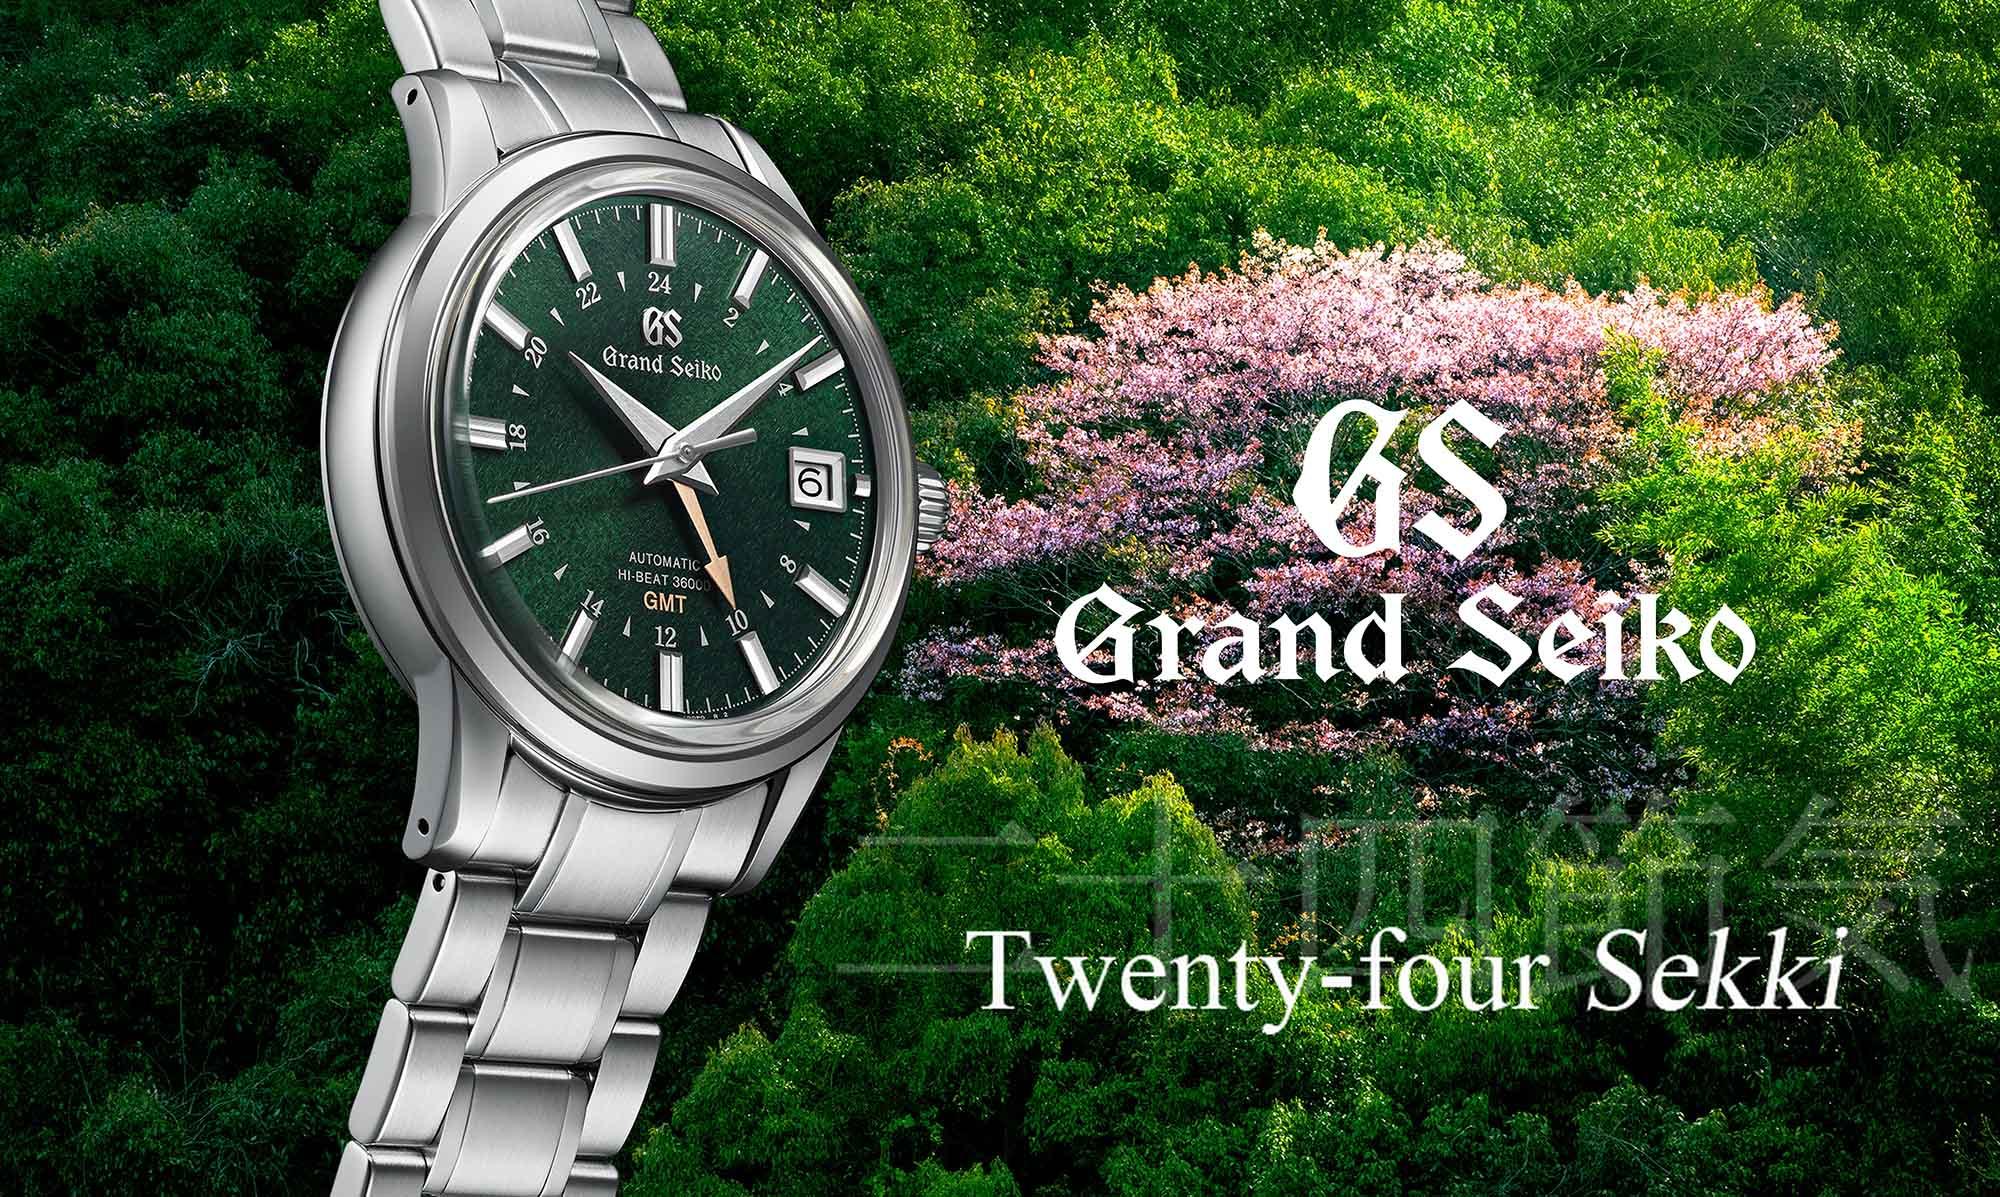 Grand Seiko 24 sekki